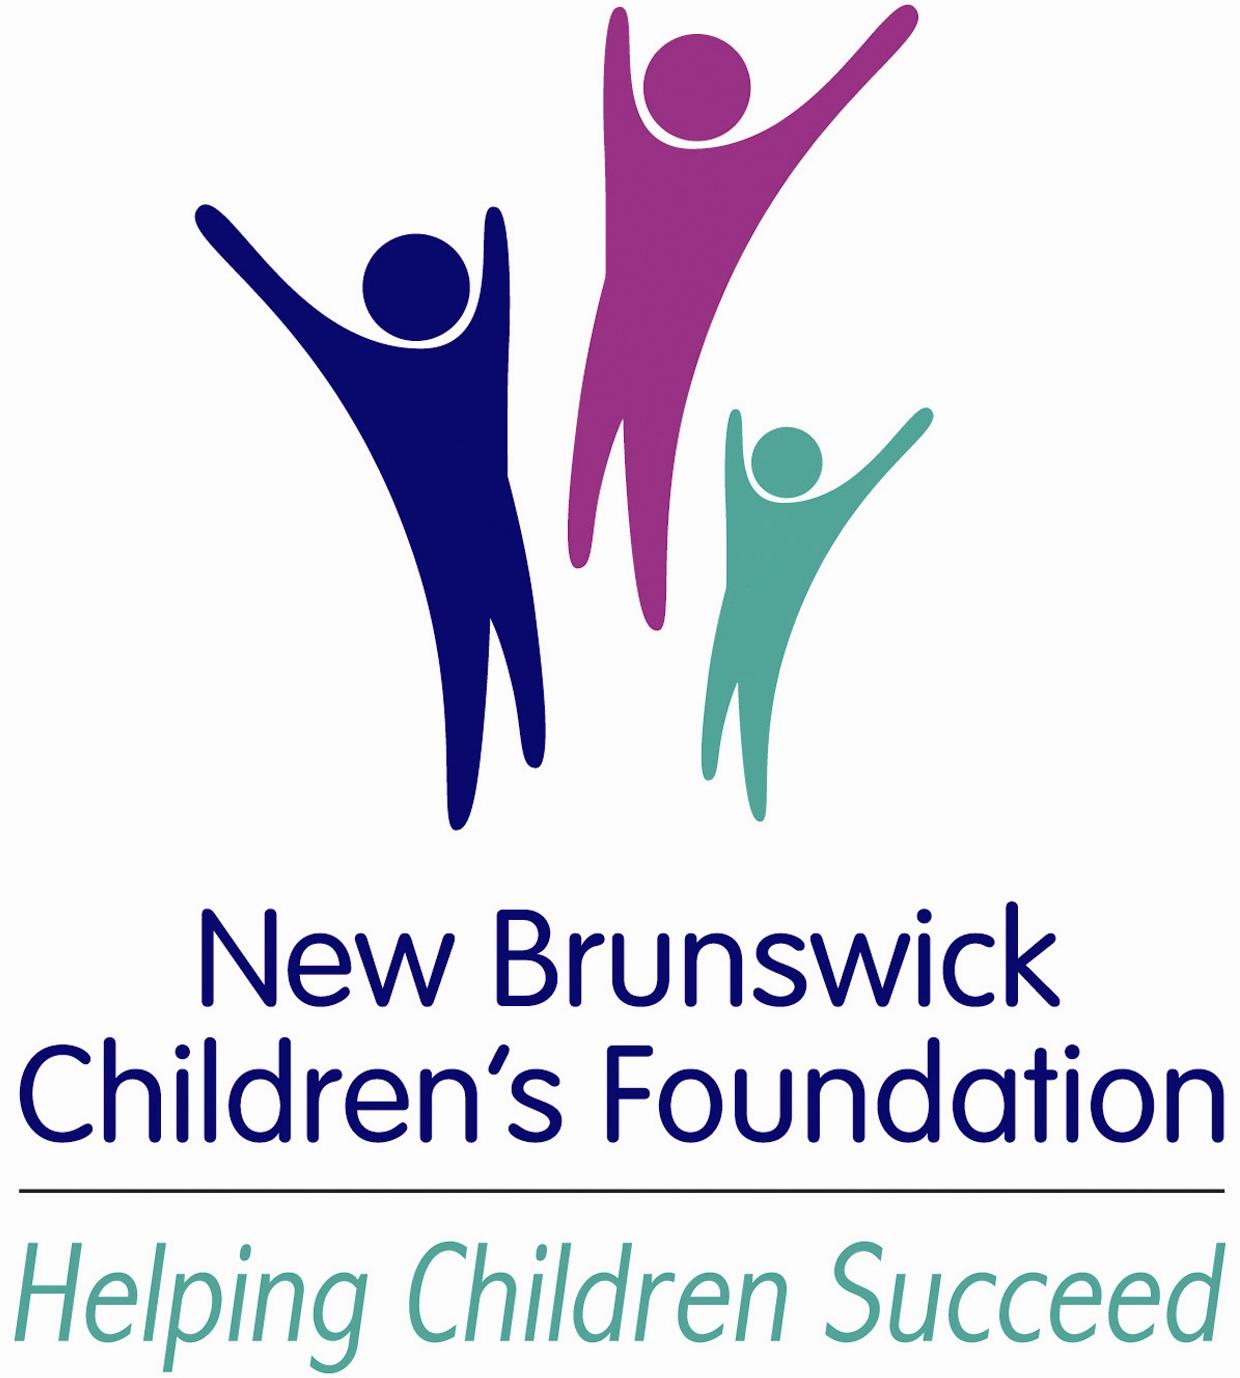 NBCF Logo & Name